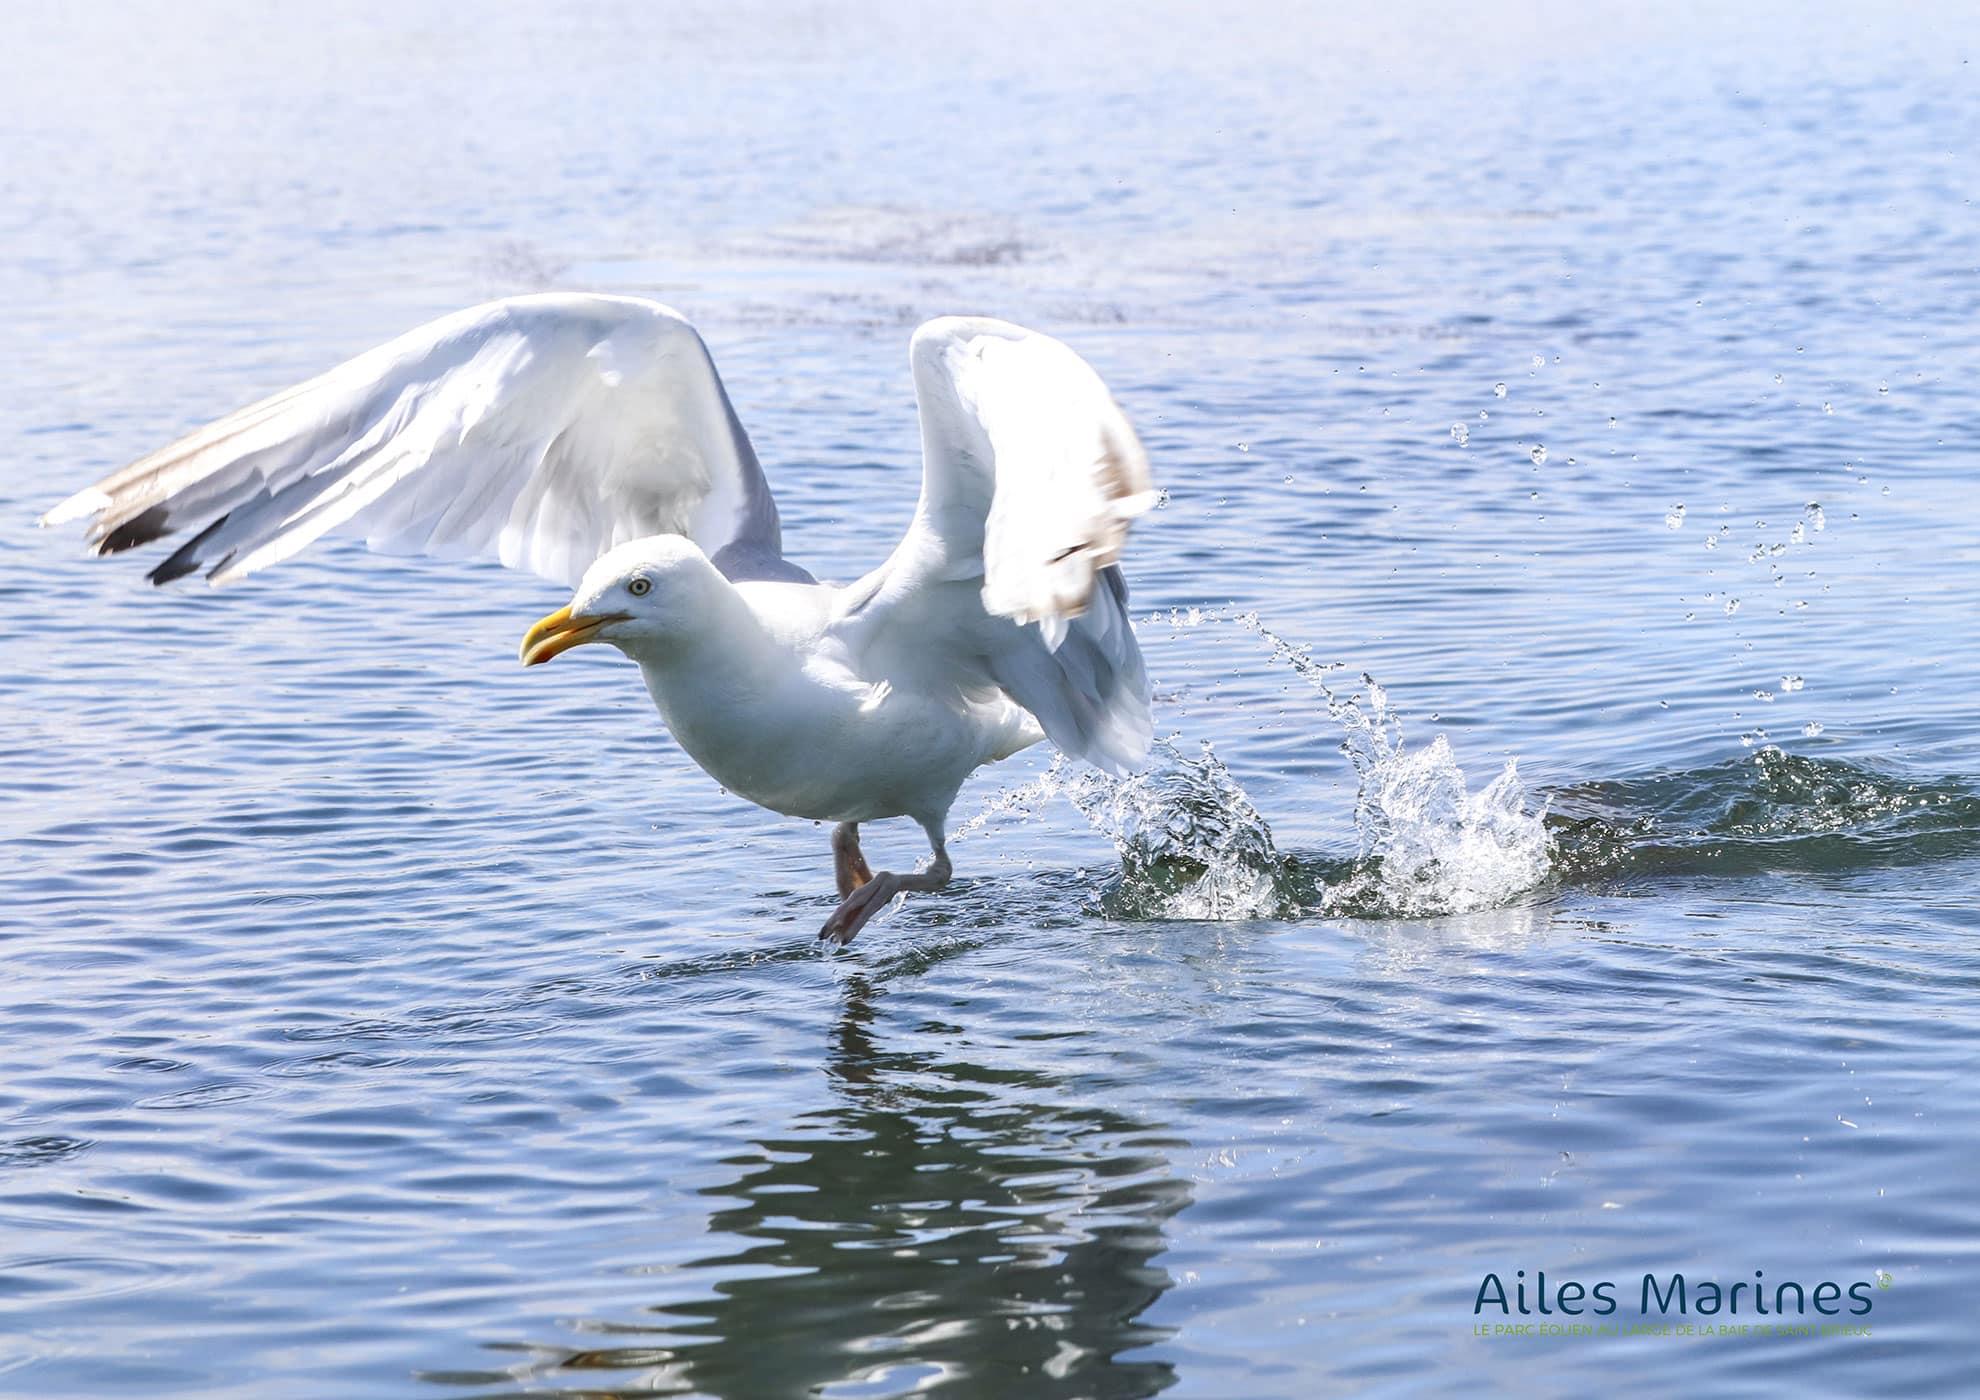 ailes-marines-goeland-adulte-argente-envol